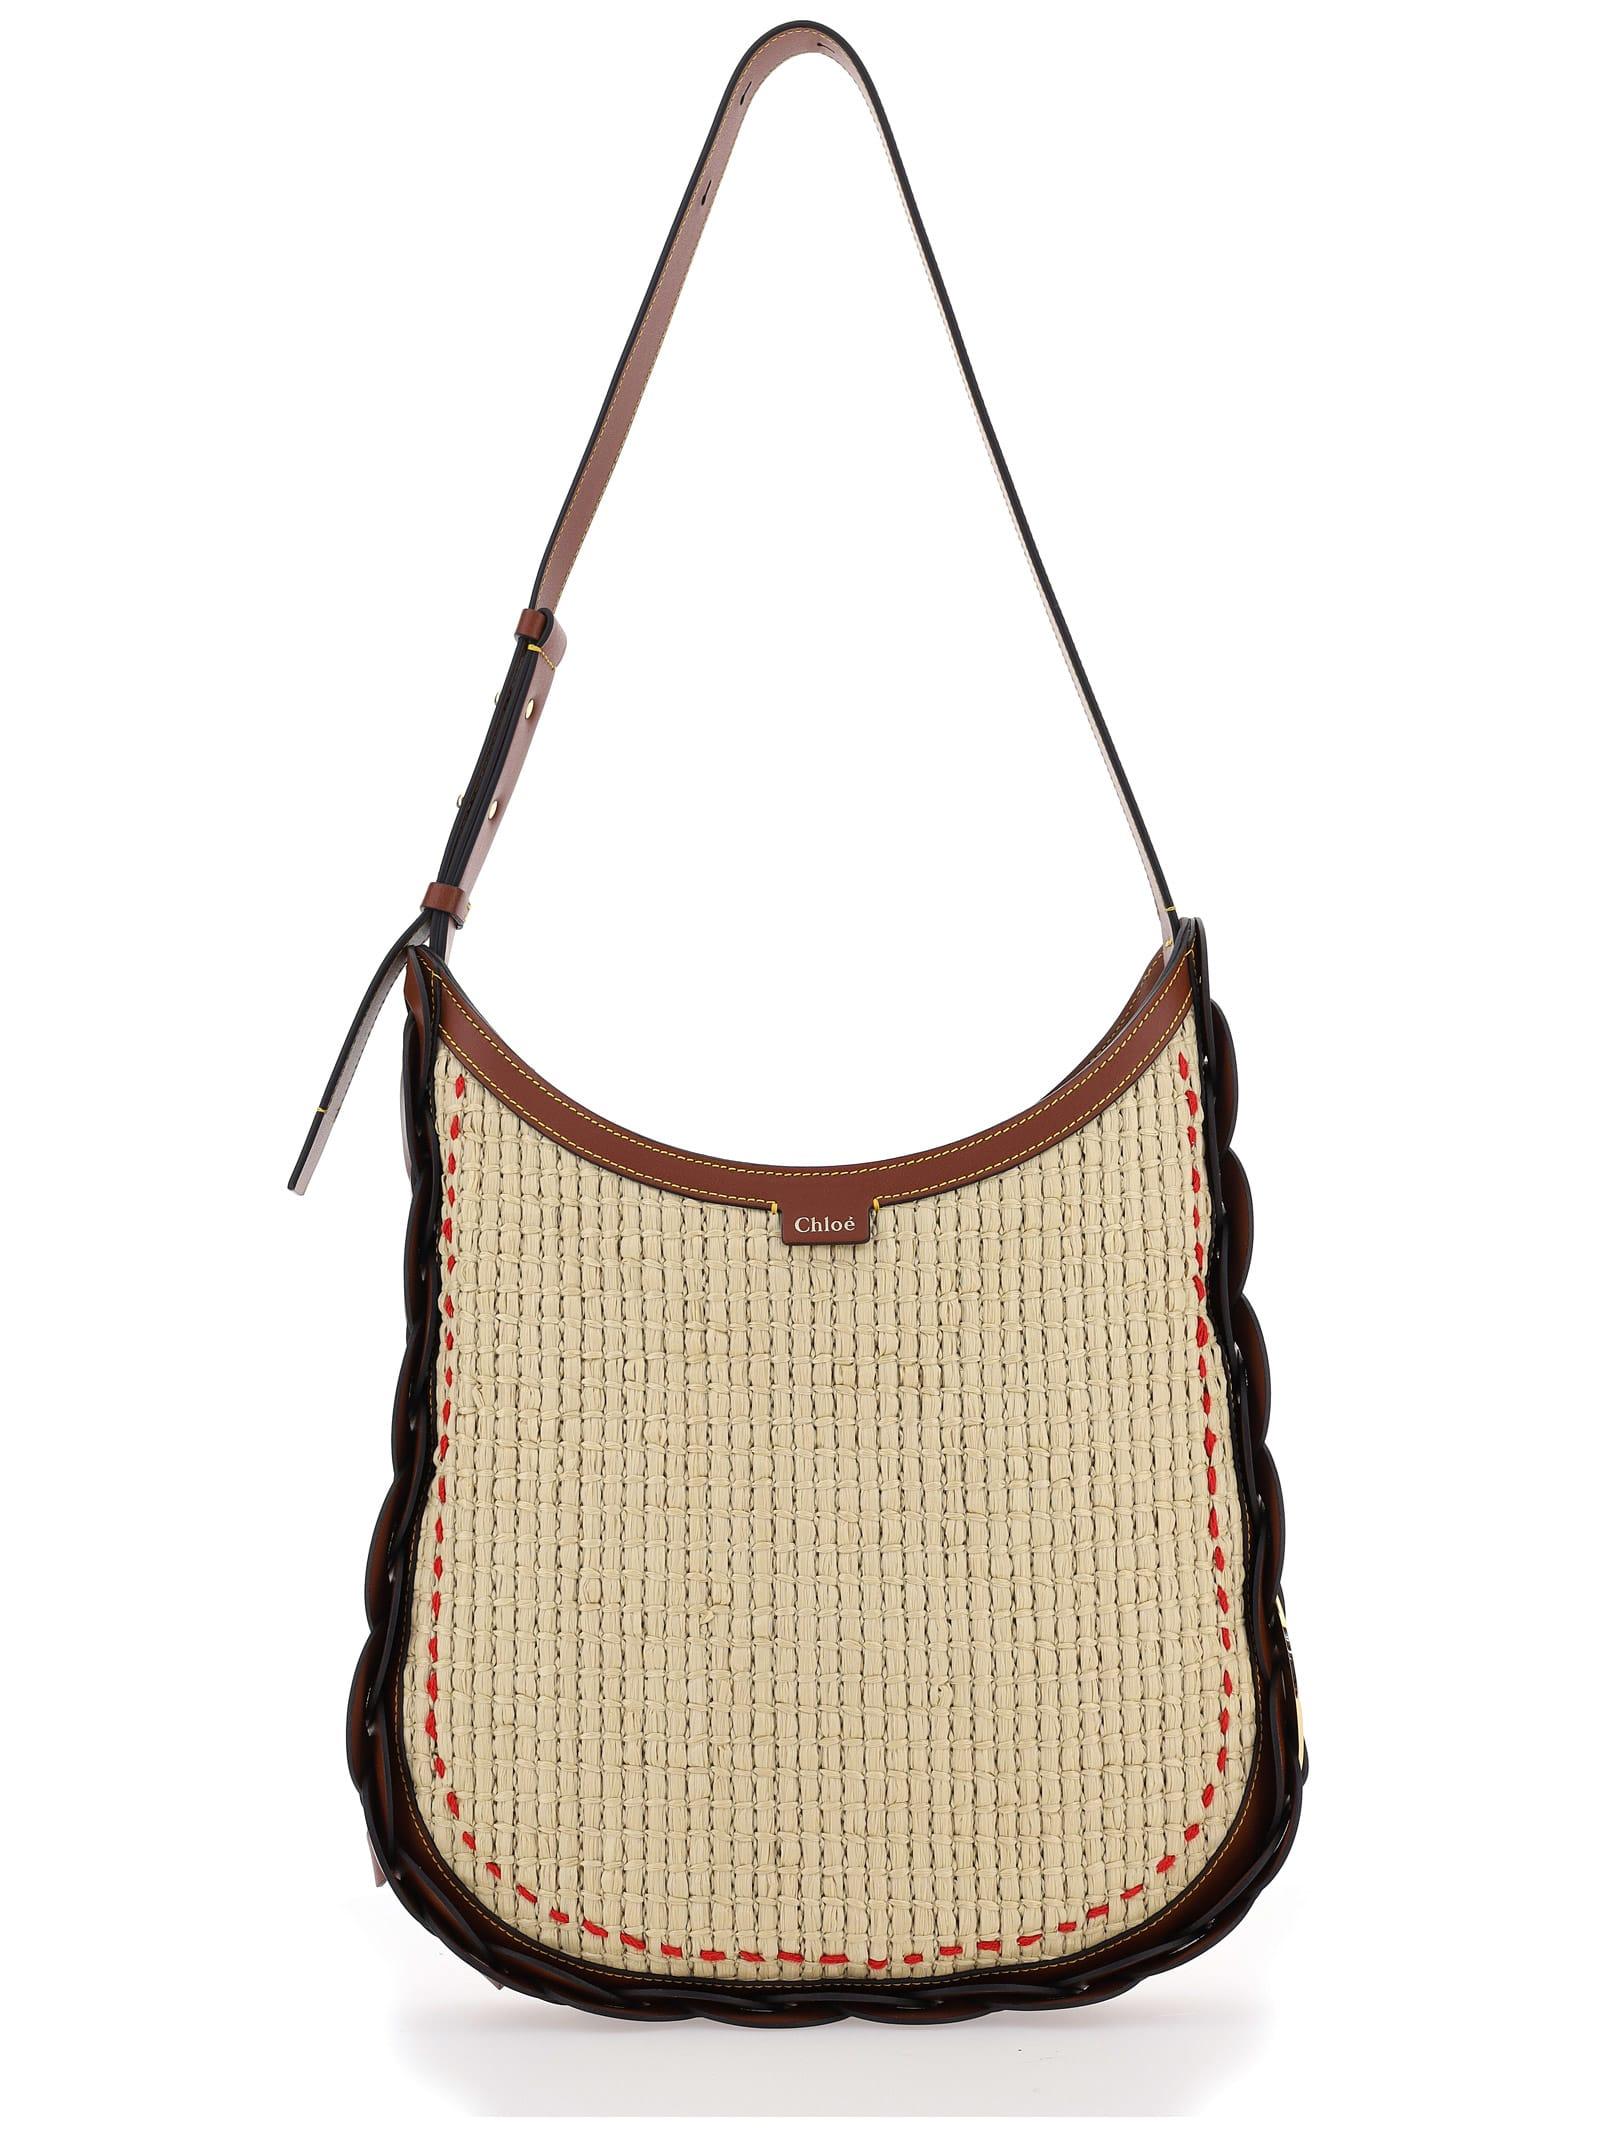 Chloè Darryl Shoulder Bag